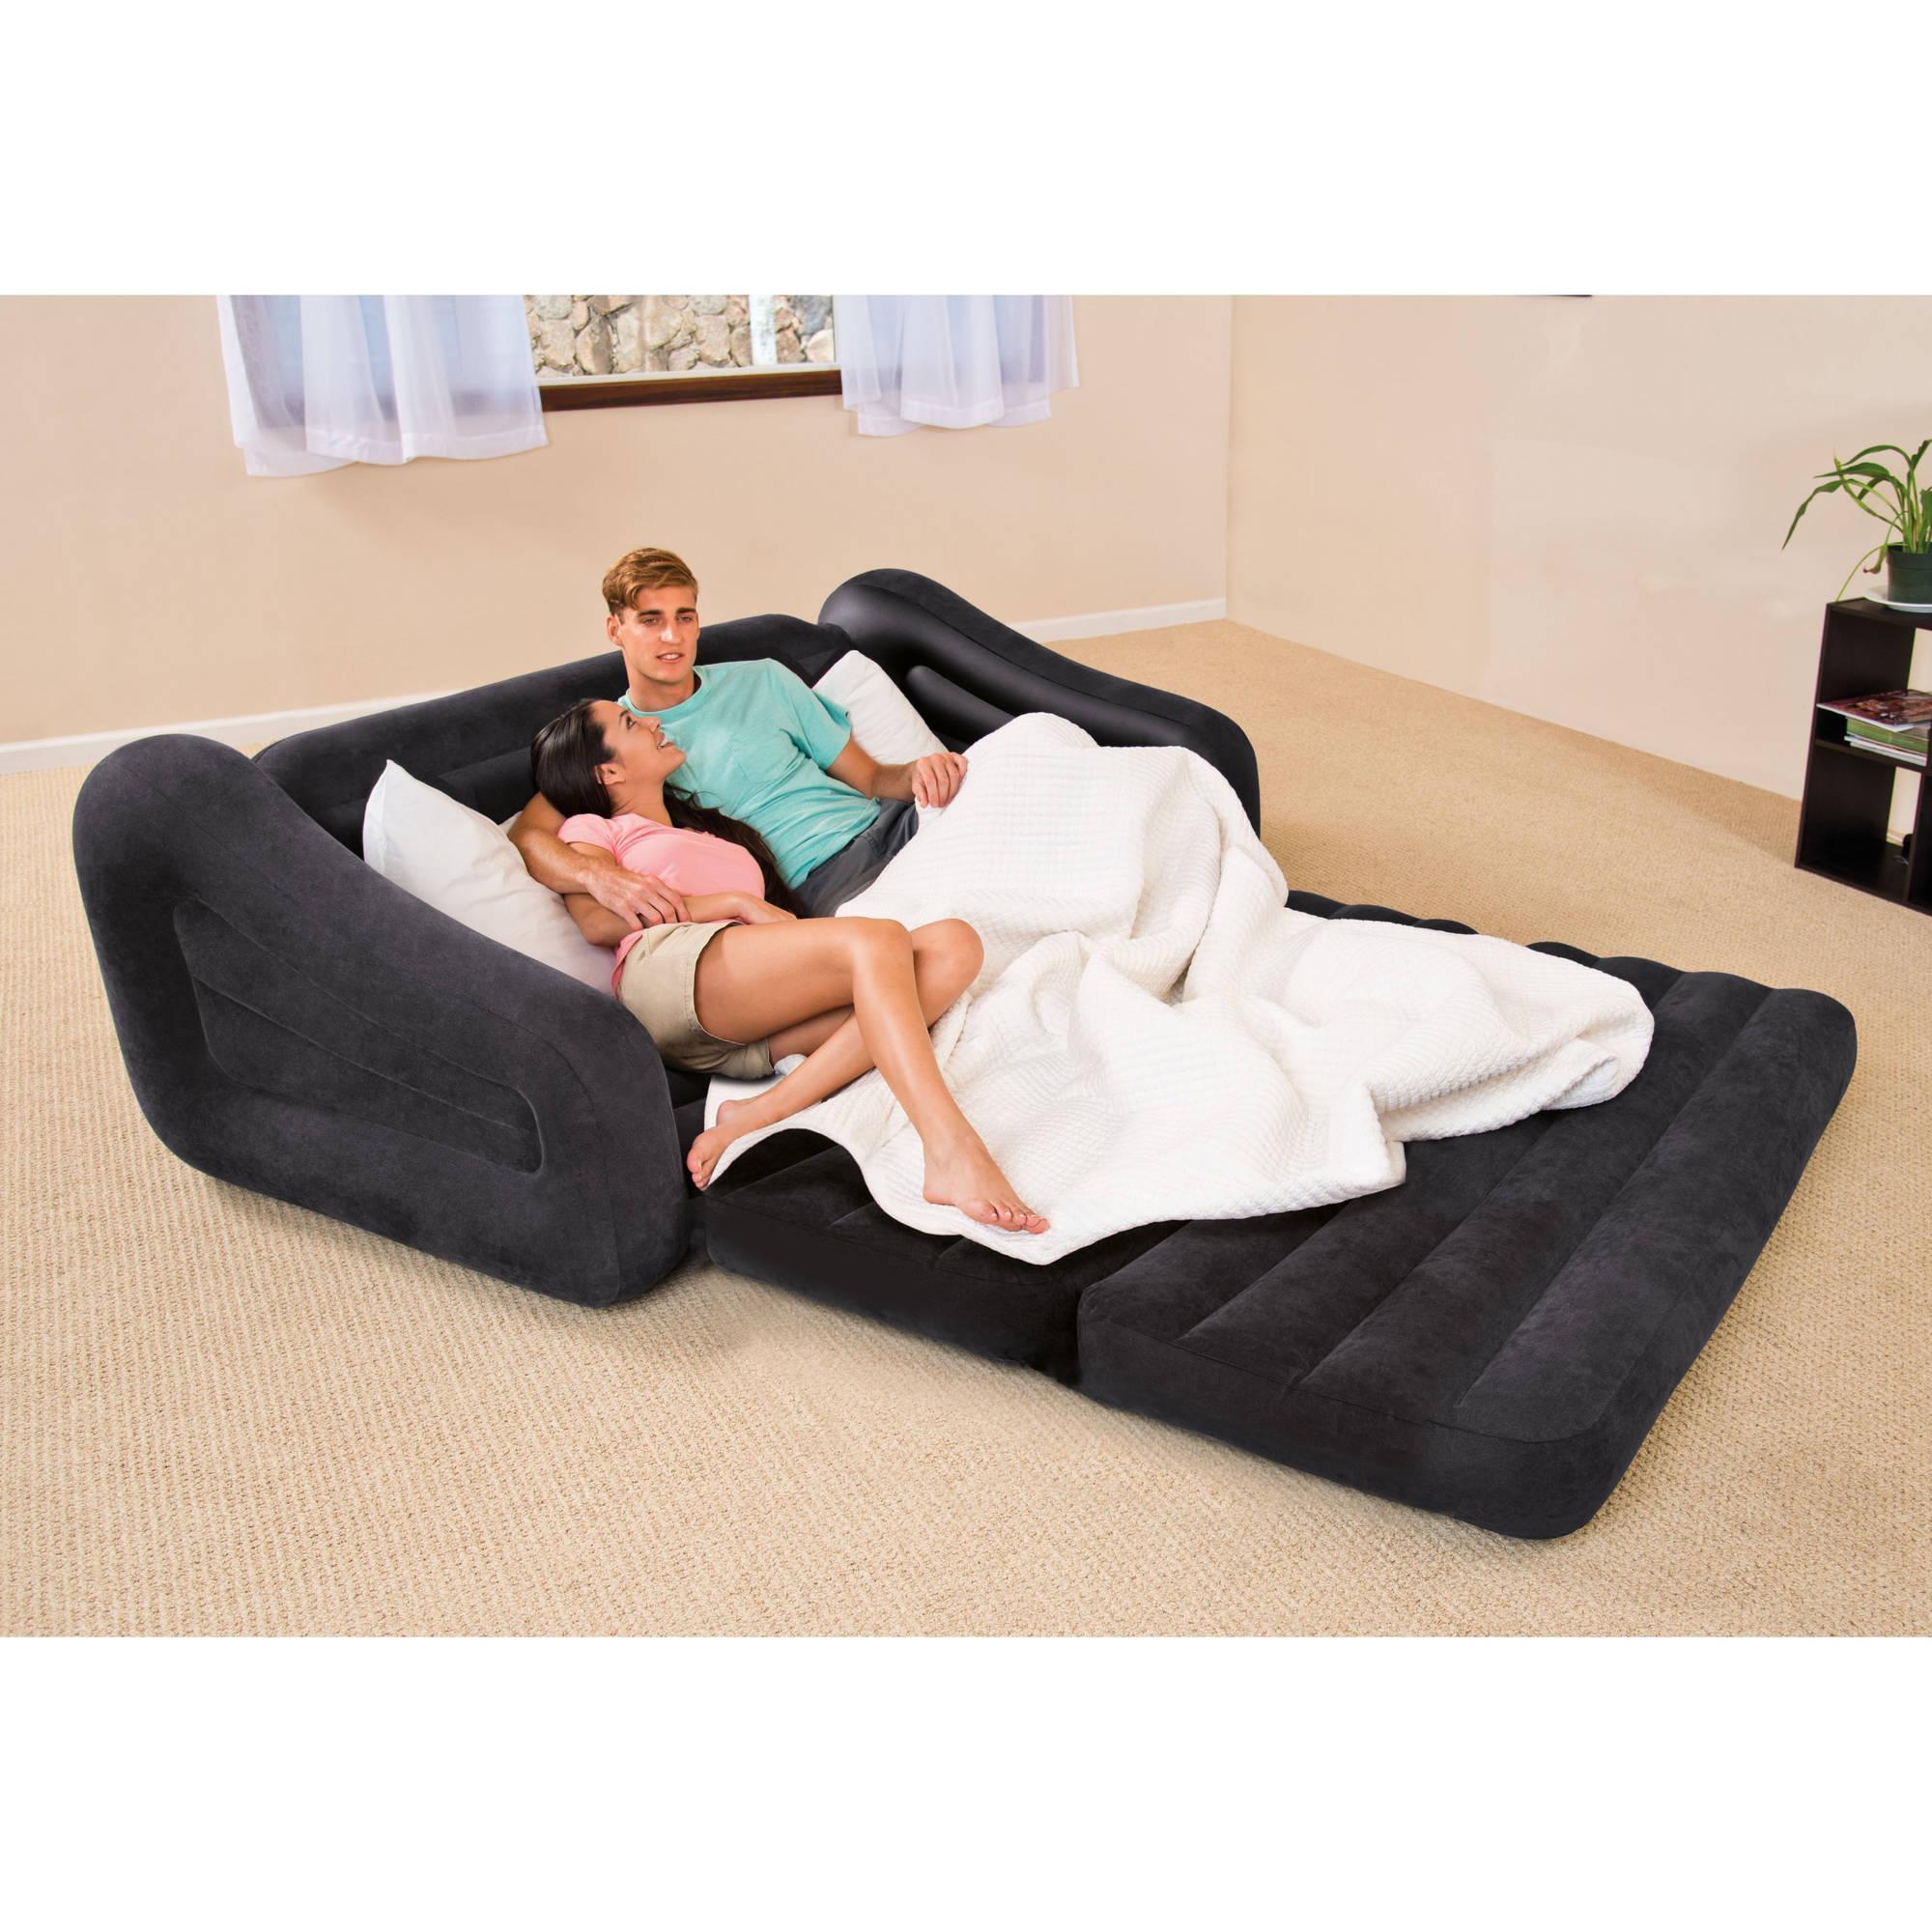 Intex Air Sofa Bed Warranty